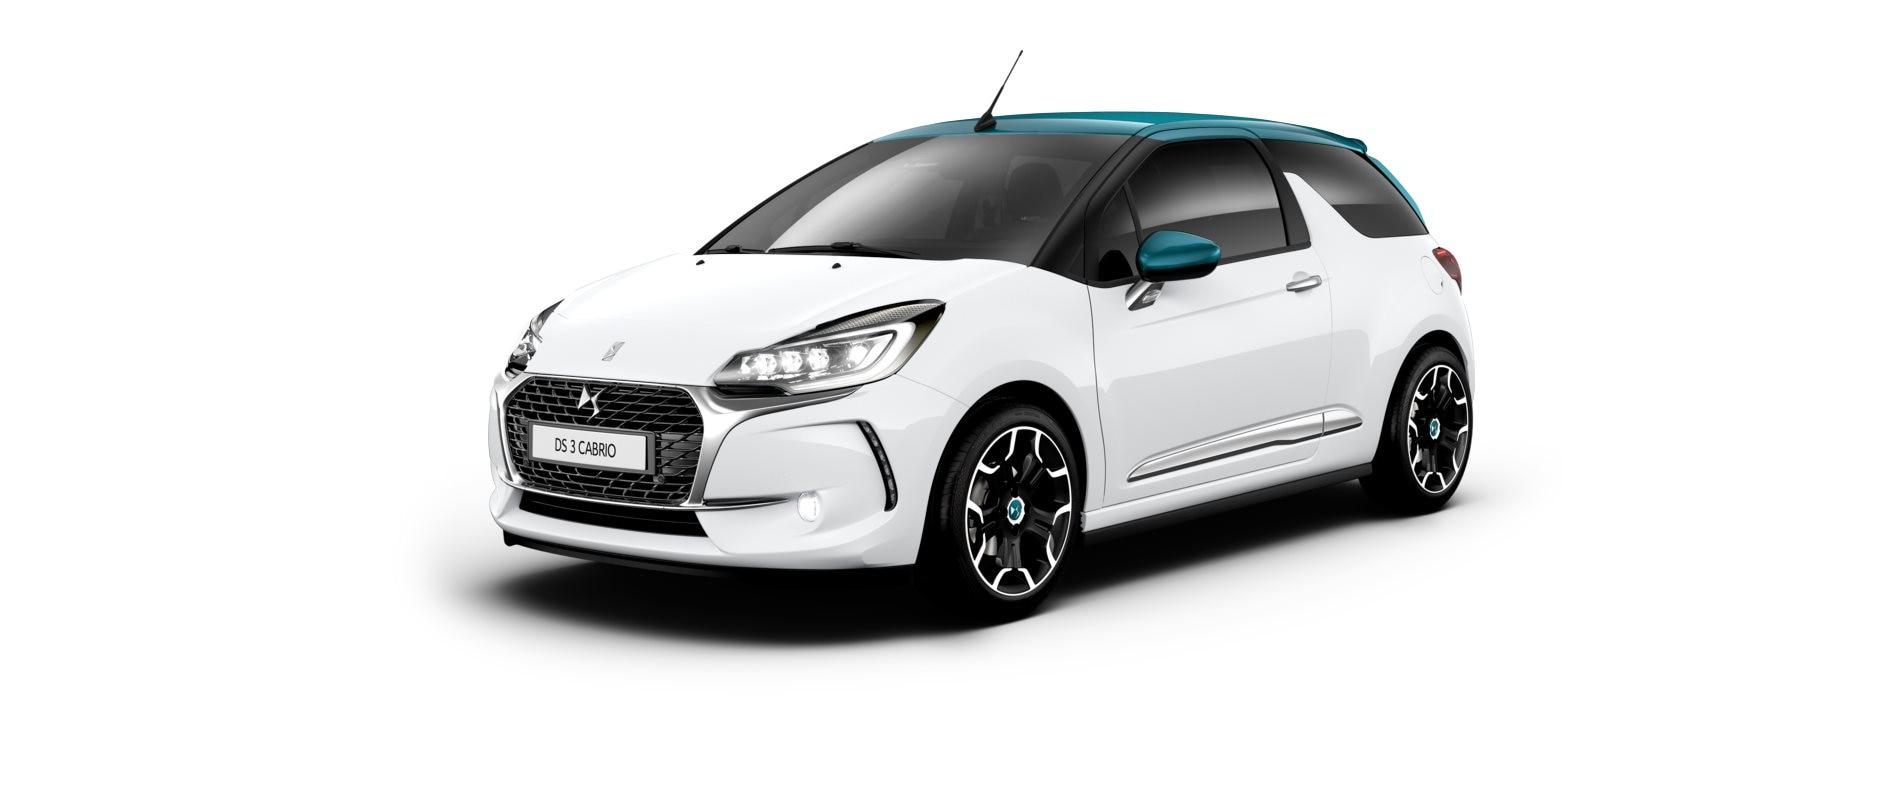 NDS3-Cabrio-Blanc-Banquise-AV1